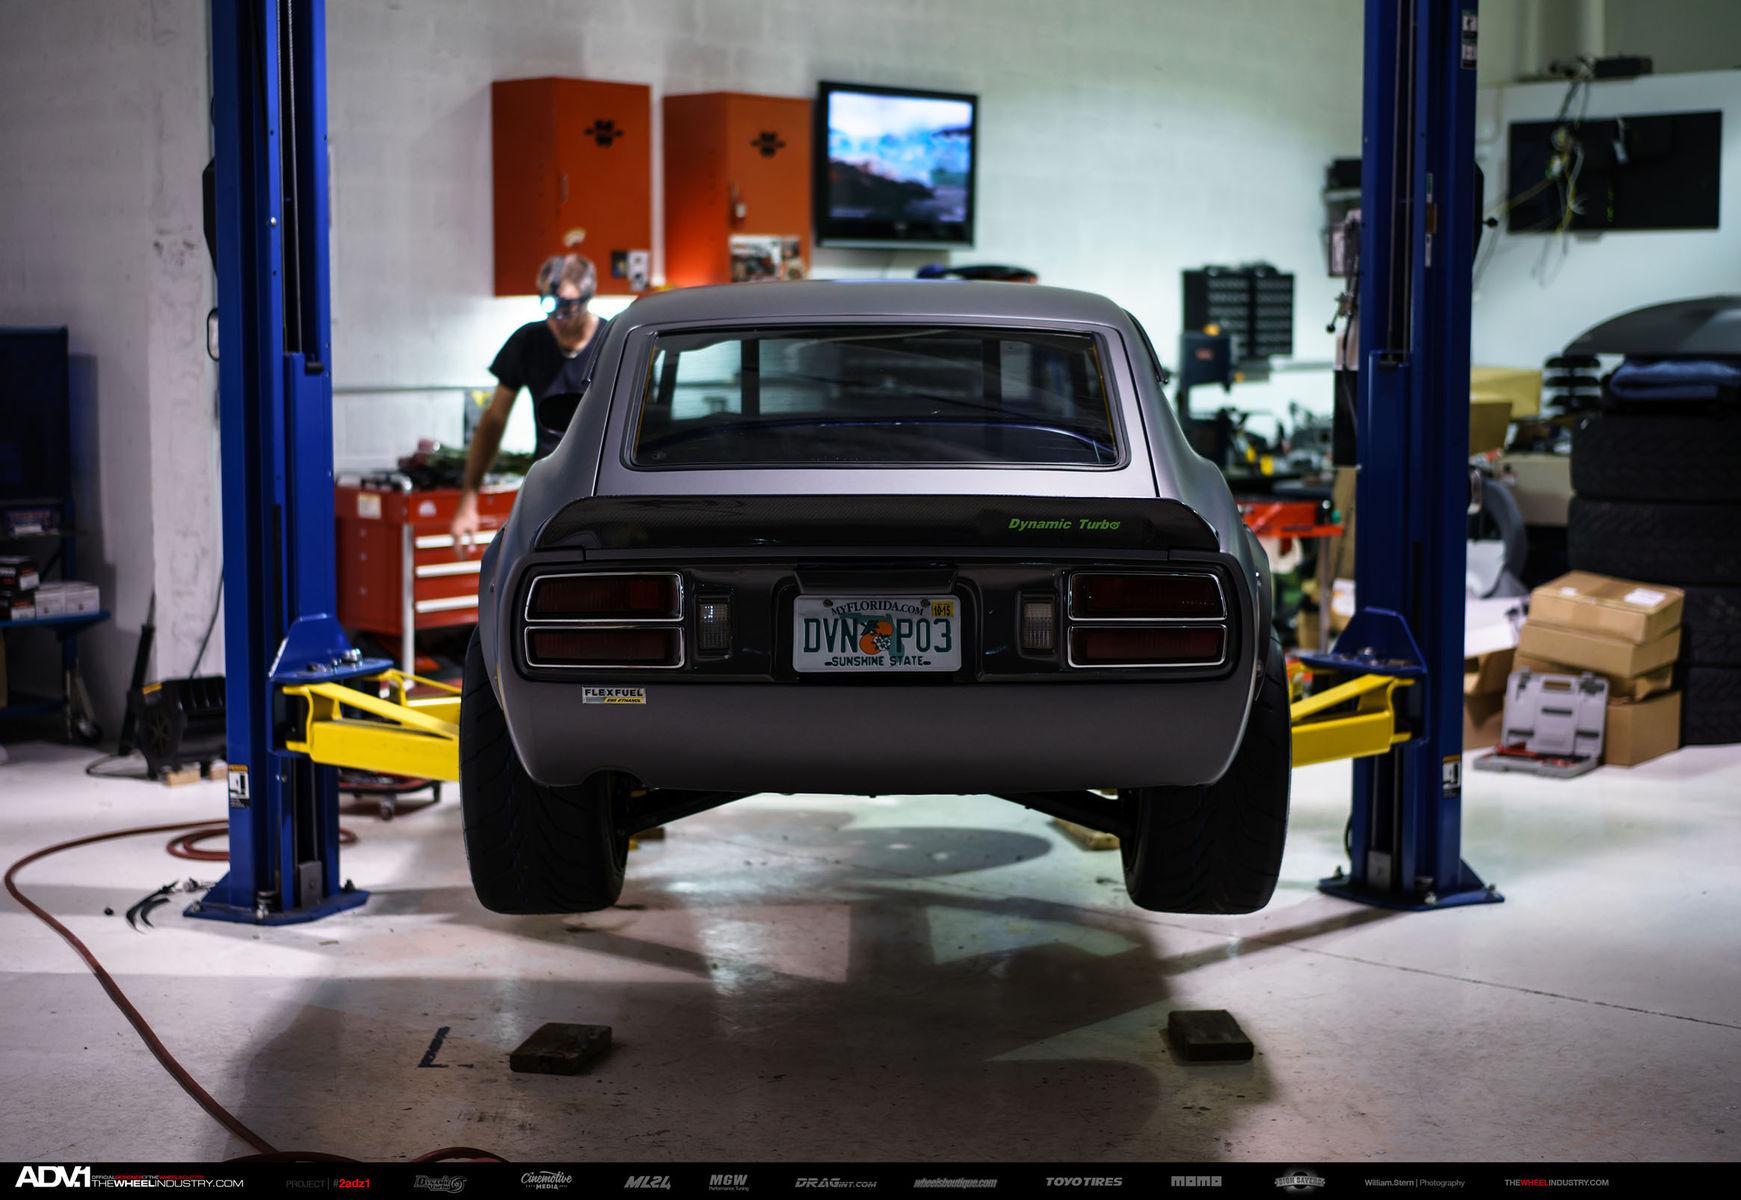 1978 Nissan  | Project 2ADV.1: 1978 Datsun 280Z